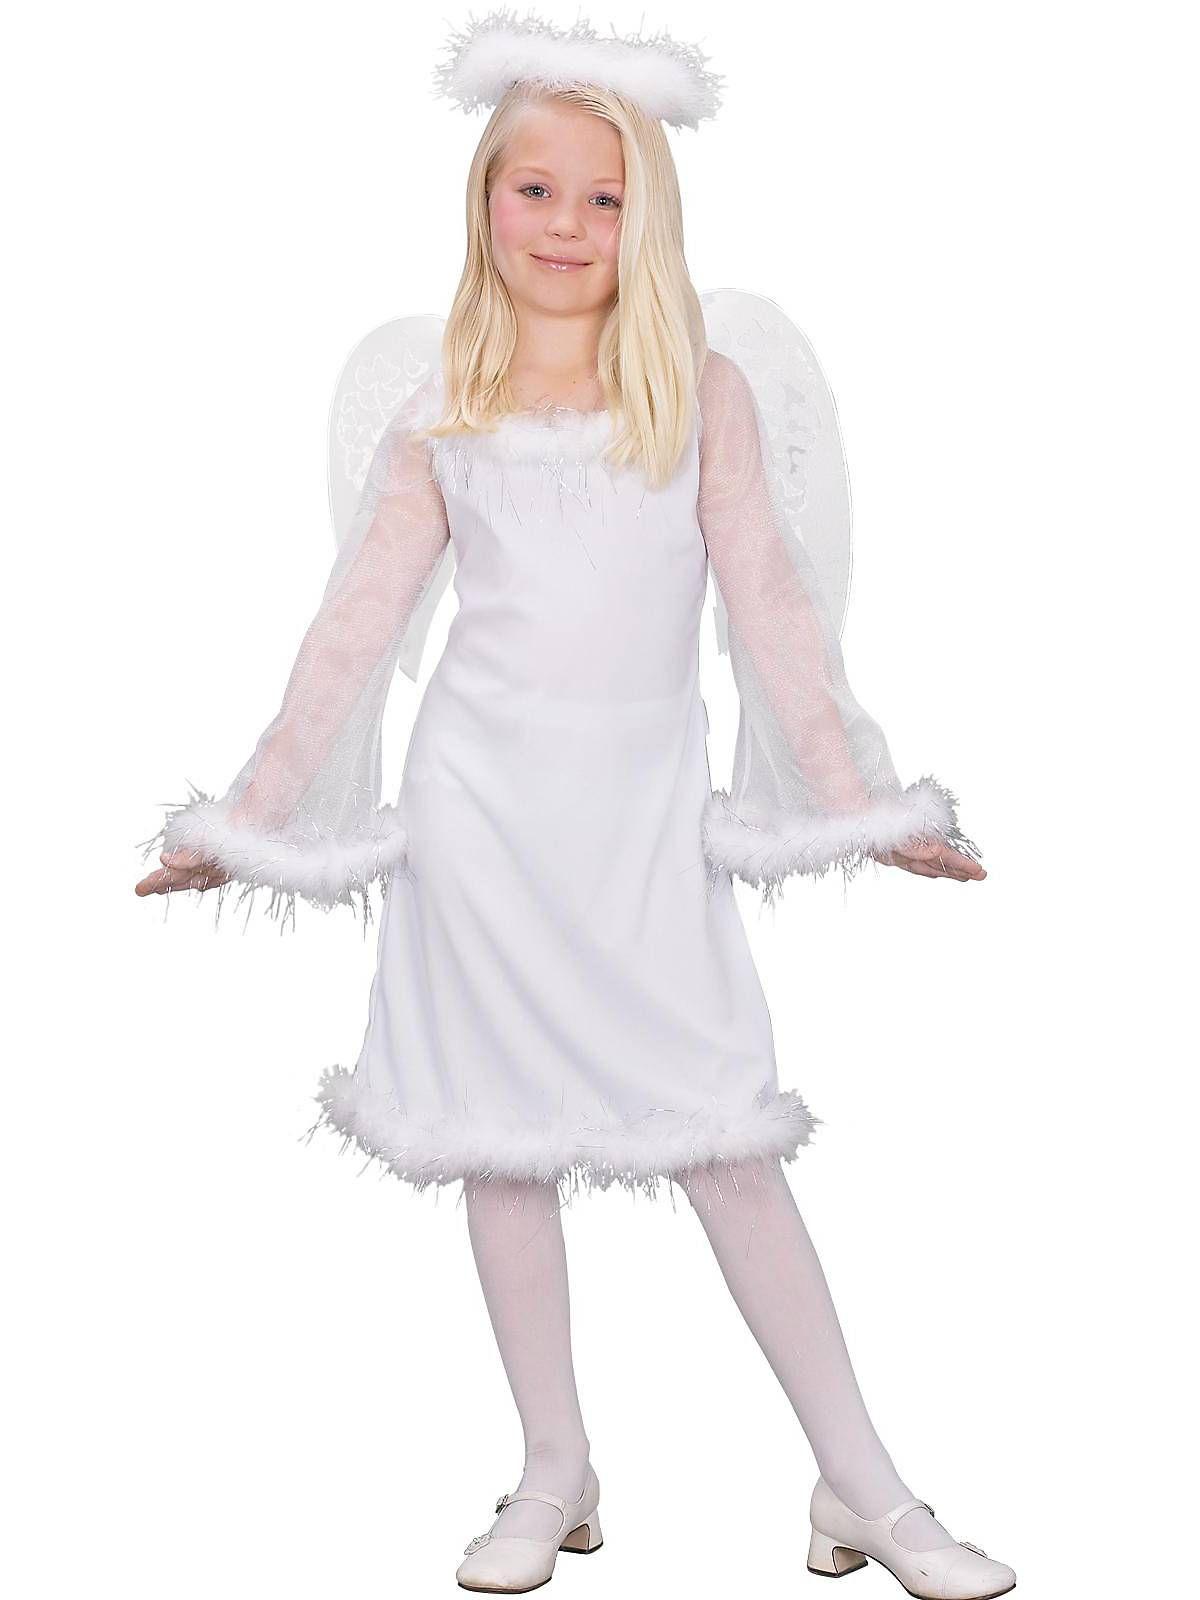 heaven sent childrens costume cheap angel costumes for girls - Kids Angel Halloween Costume